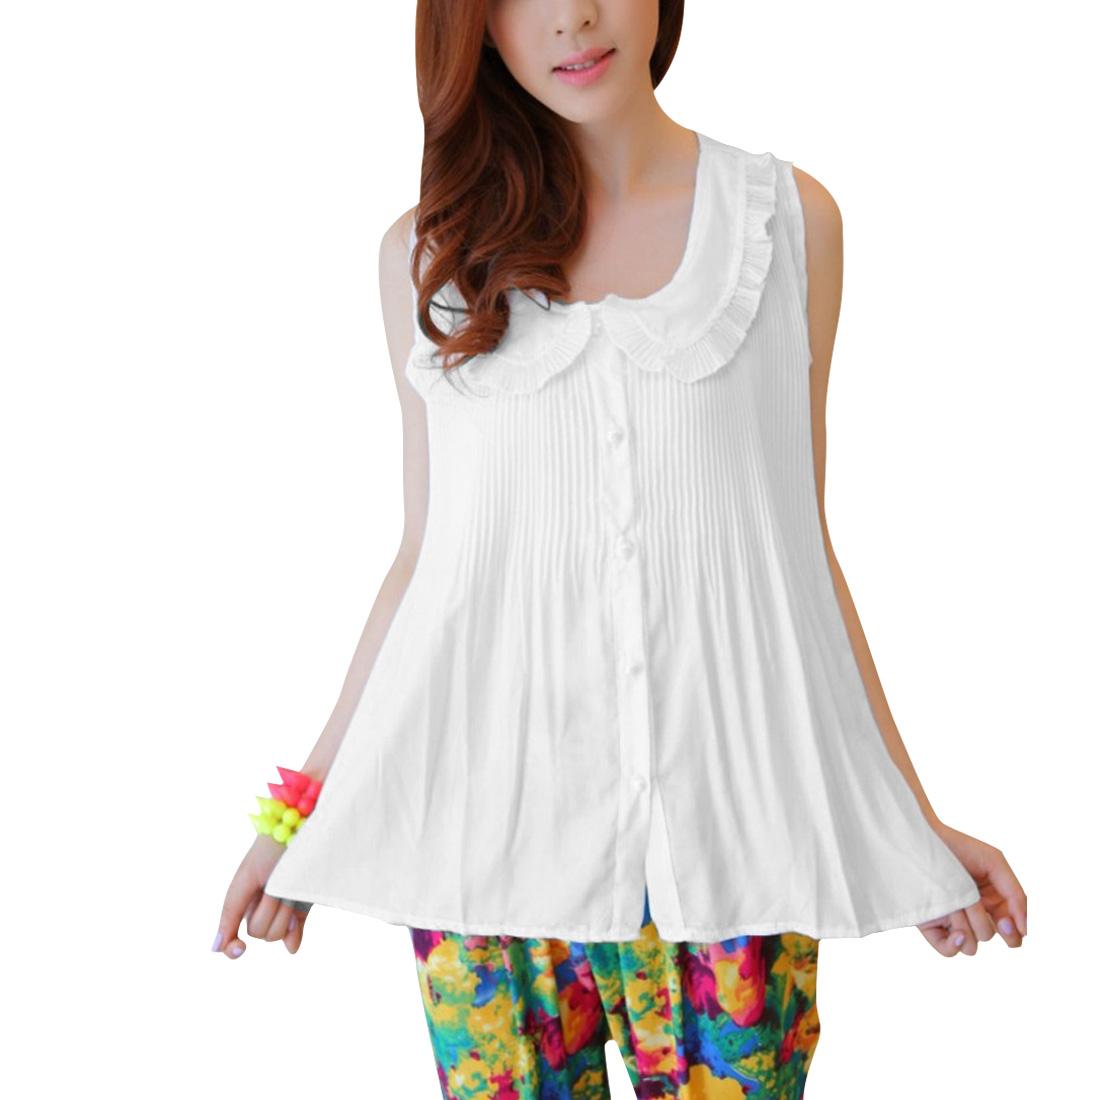 Women Single Breasted Sleveless Semi Sheer Top Shirt White S